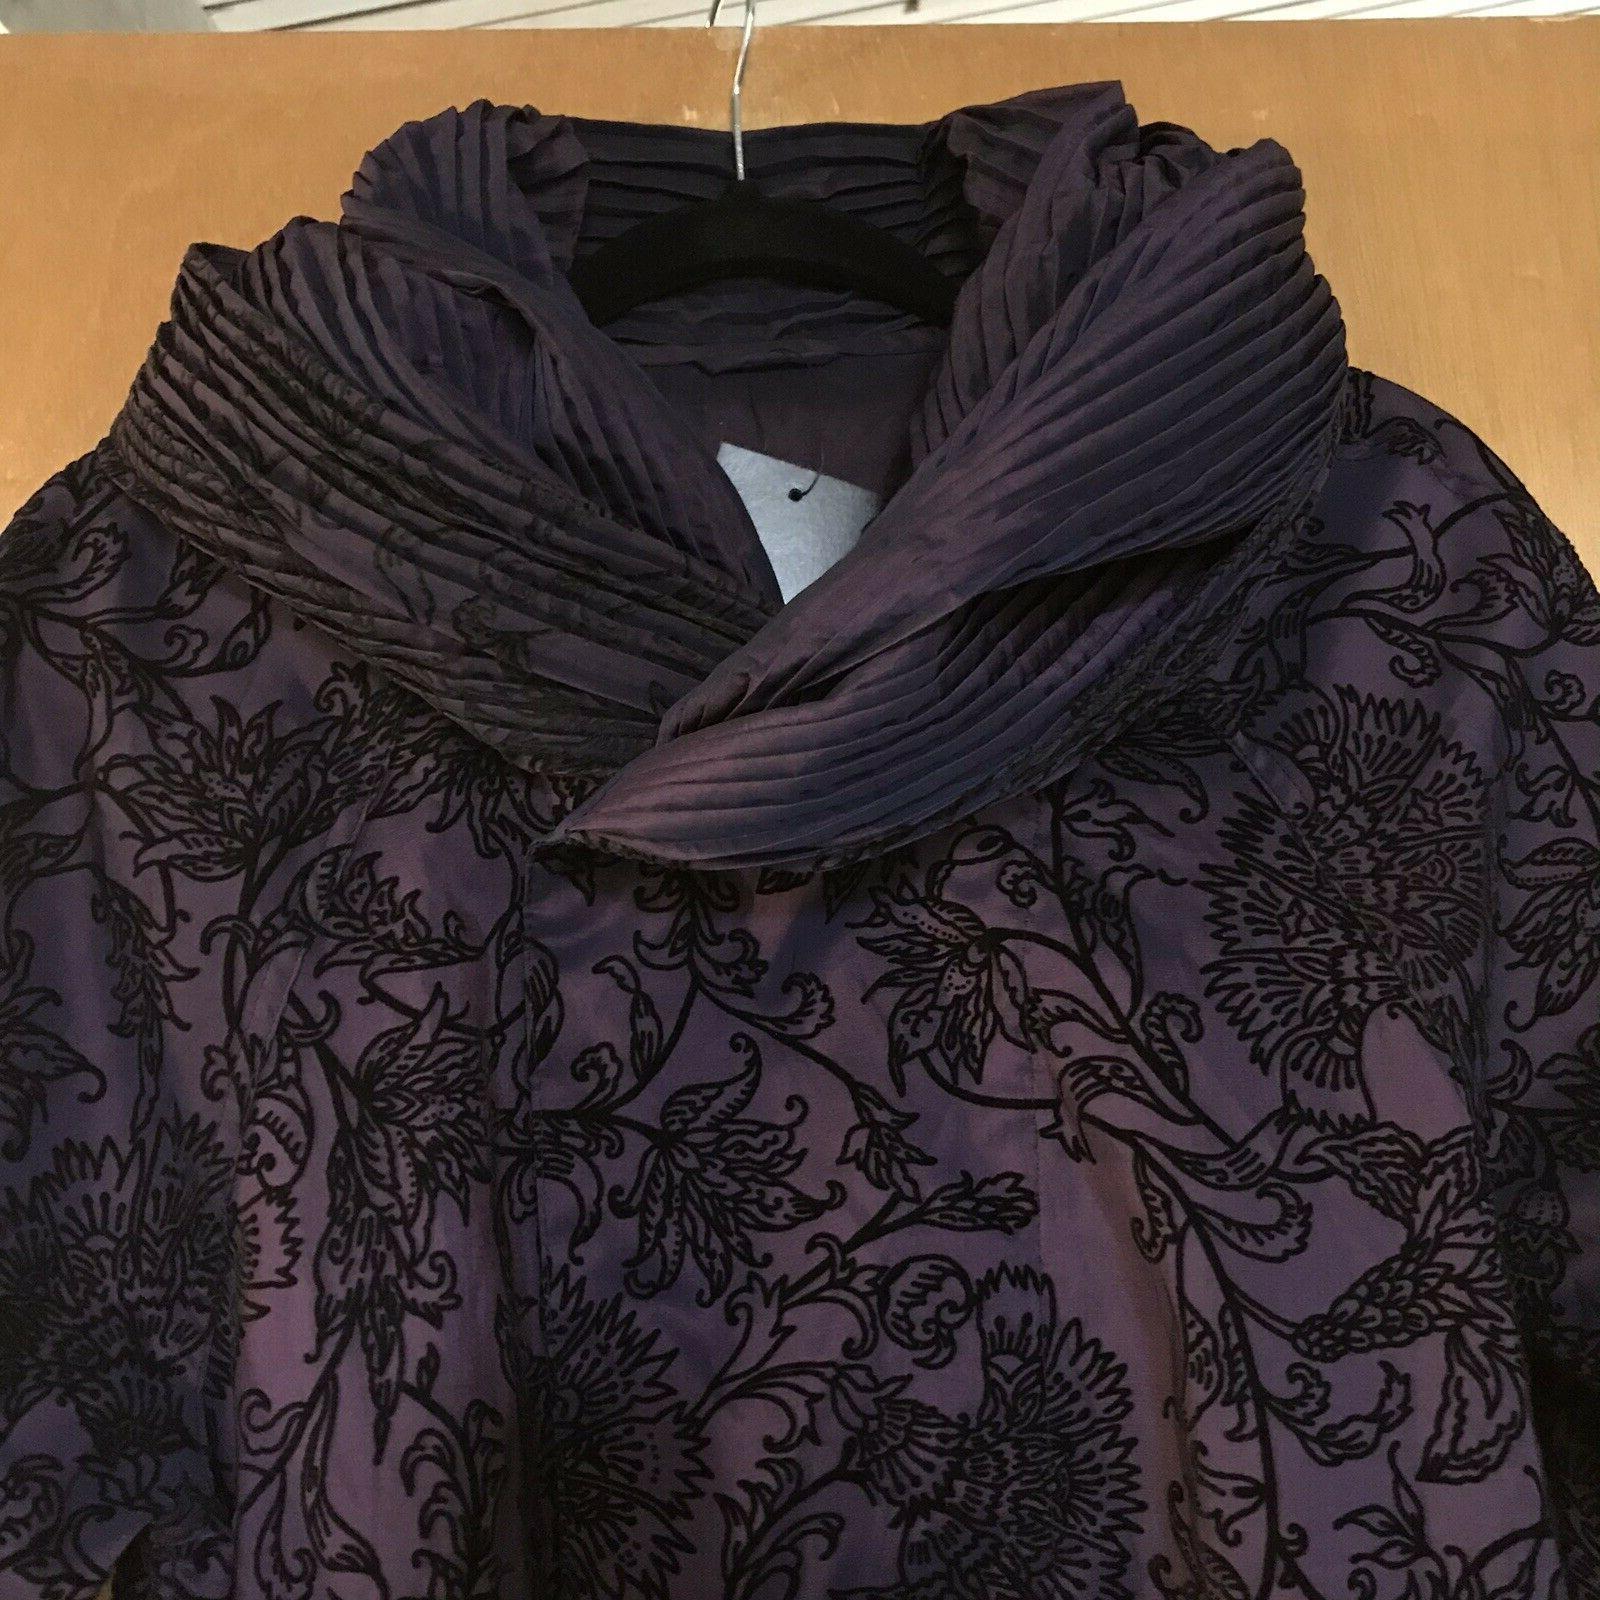 Mycra Pac Now Coat 2 Donatella Black Short Rare $253